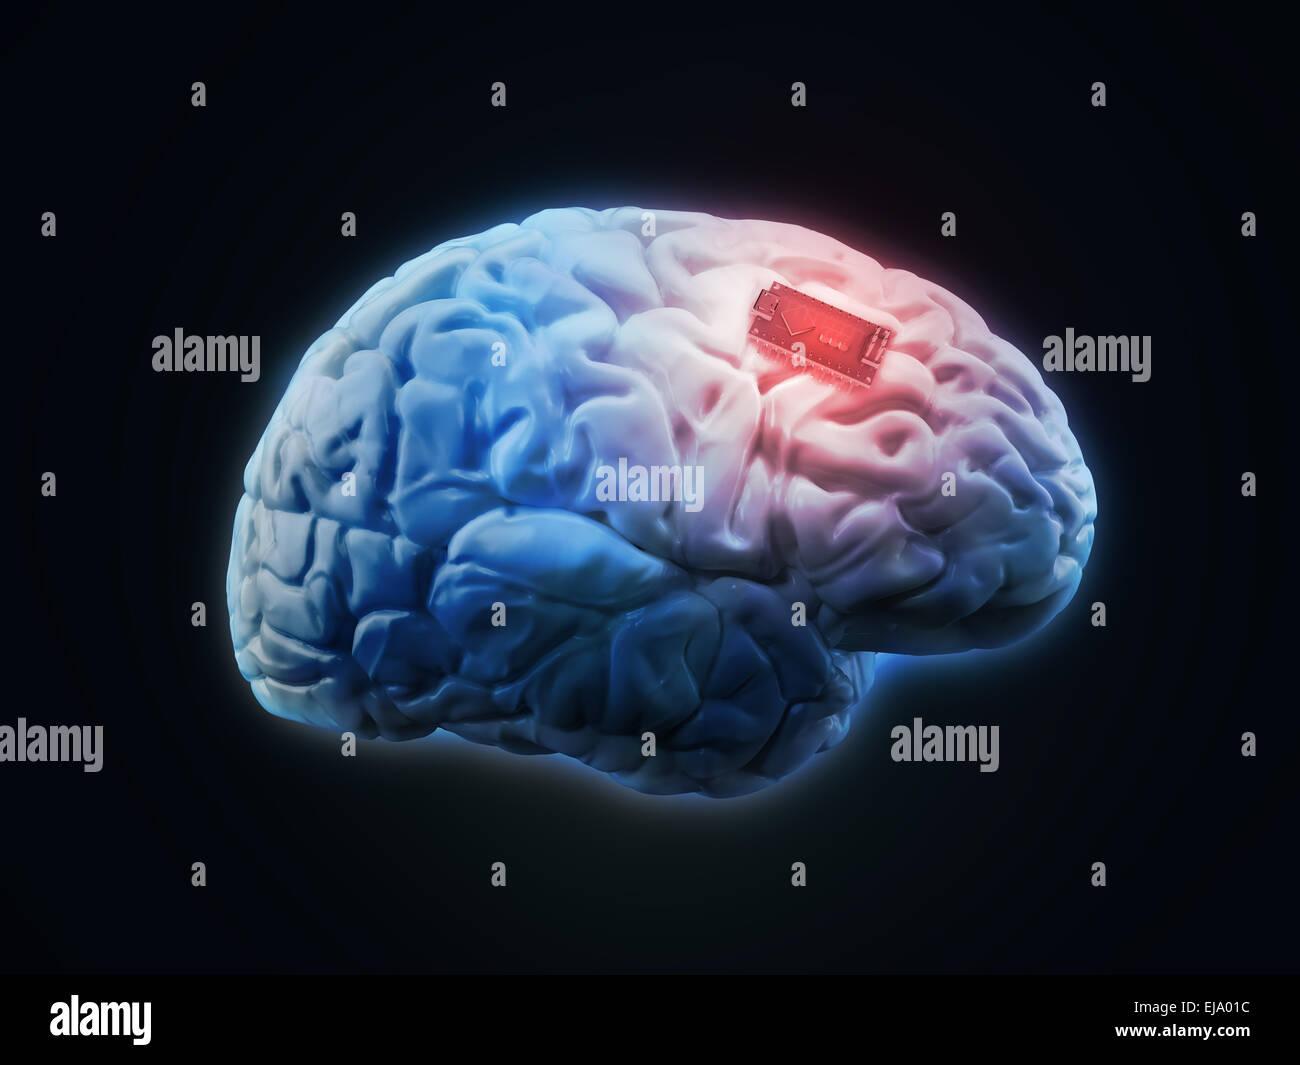 Human brain implant concept illustration - Stock Image